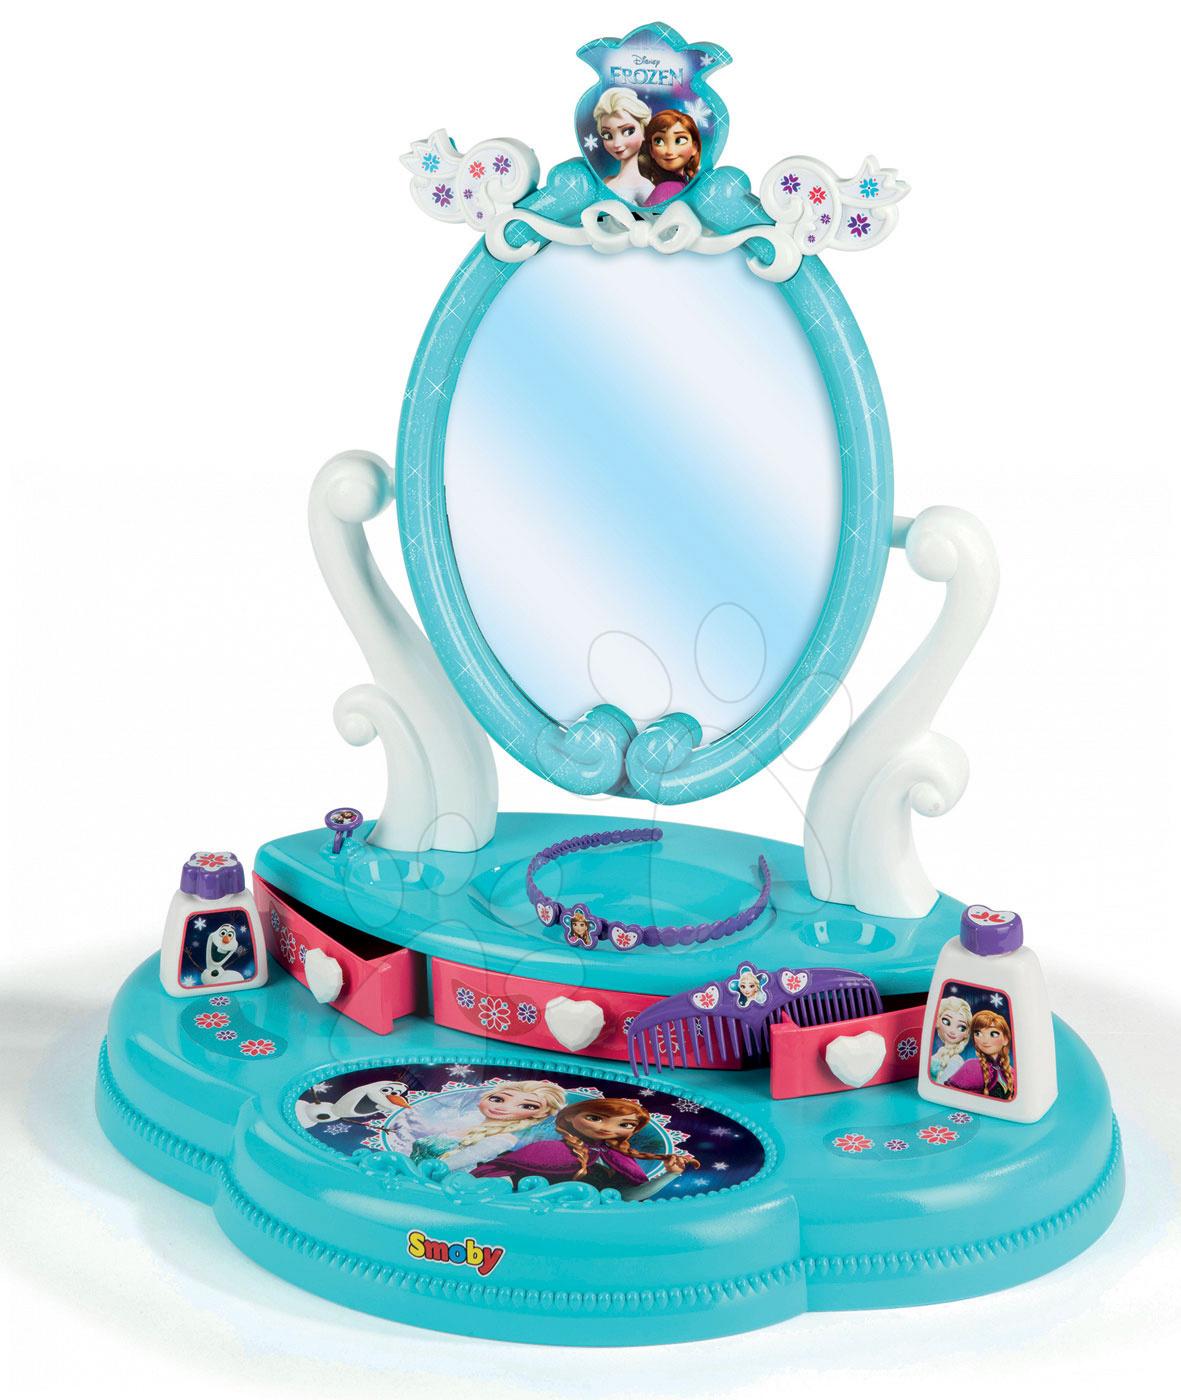 Kozmetický stolík Disney Top Frozen Smoby s 5 doplnkami akvamarínový